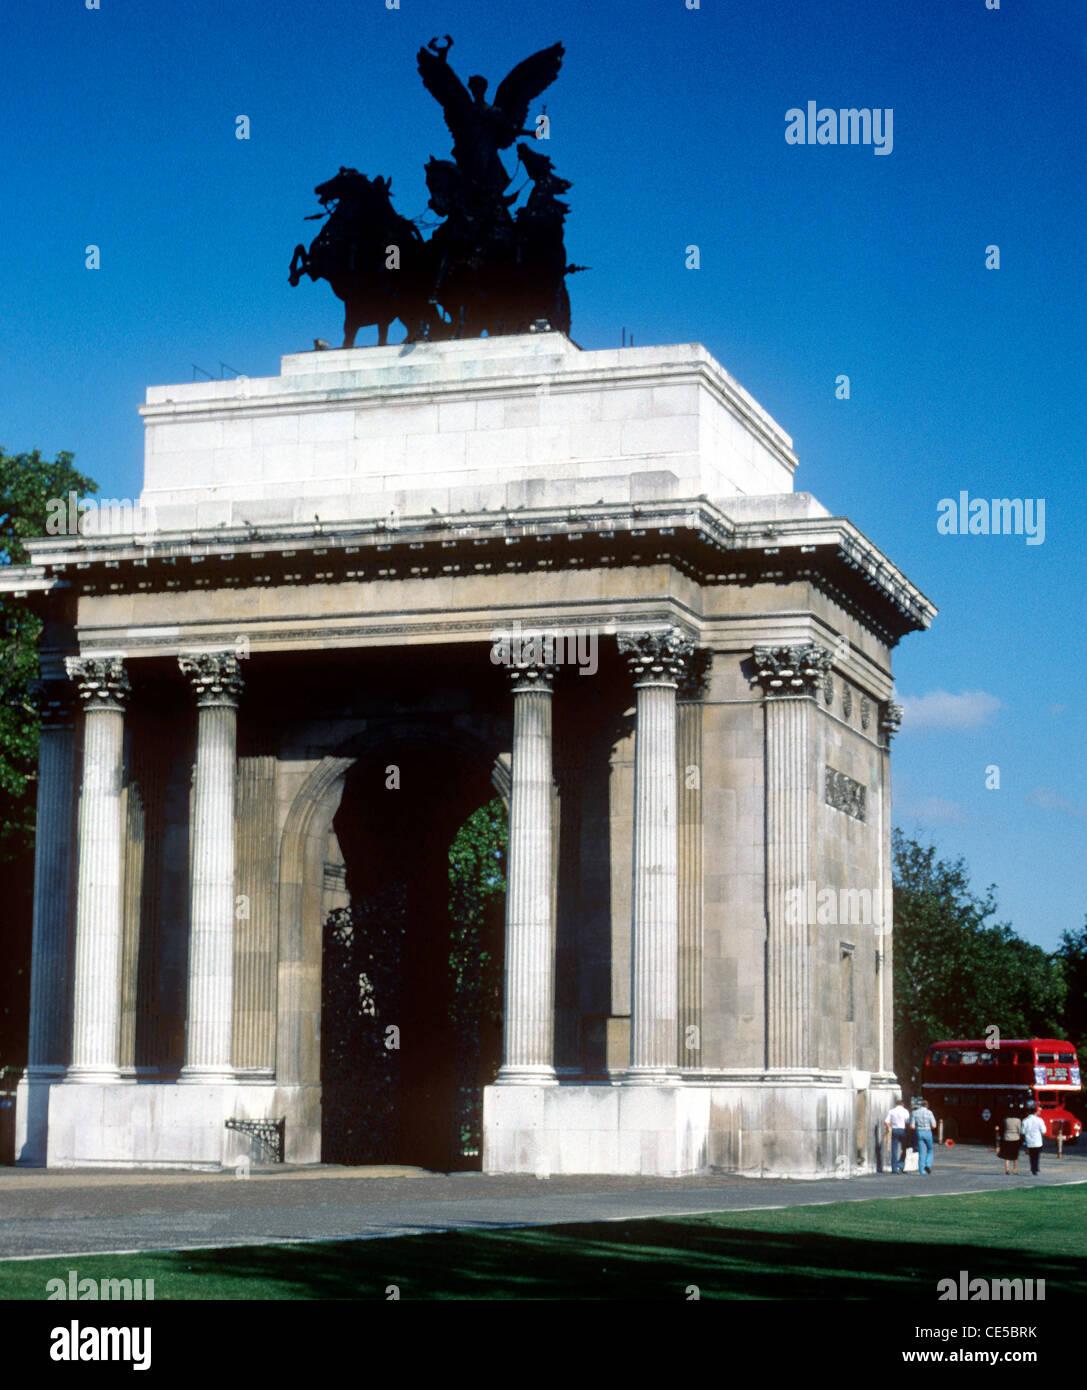 Constitution Arch, Wellington Arch, Hyde Park Corner, London England UK - Stock Image